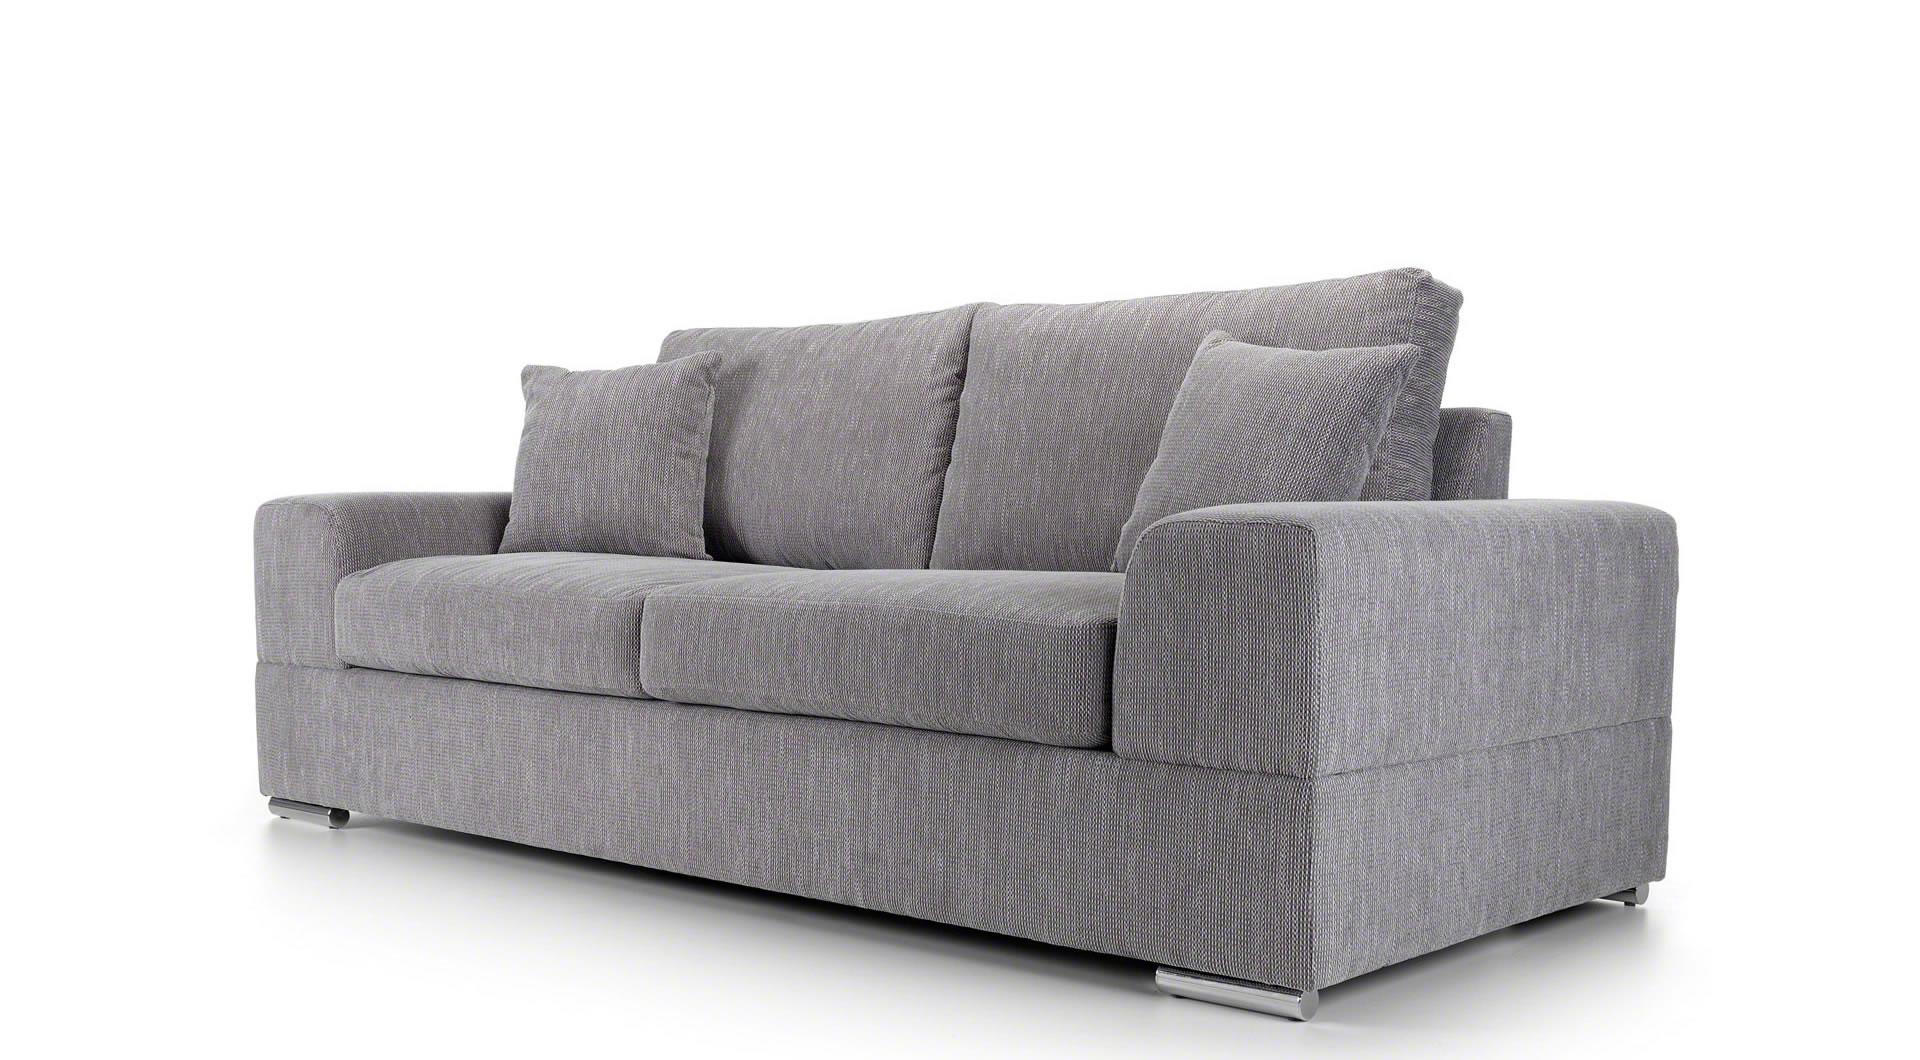 light grey sofa bed uk foam design veda 2 seater mysmallspace